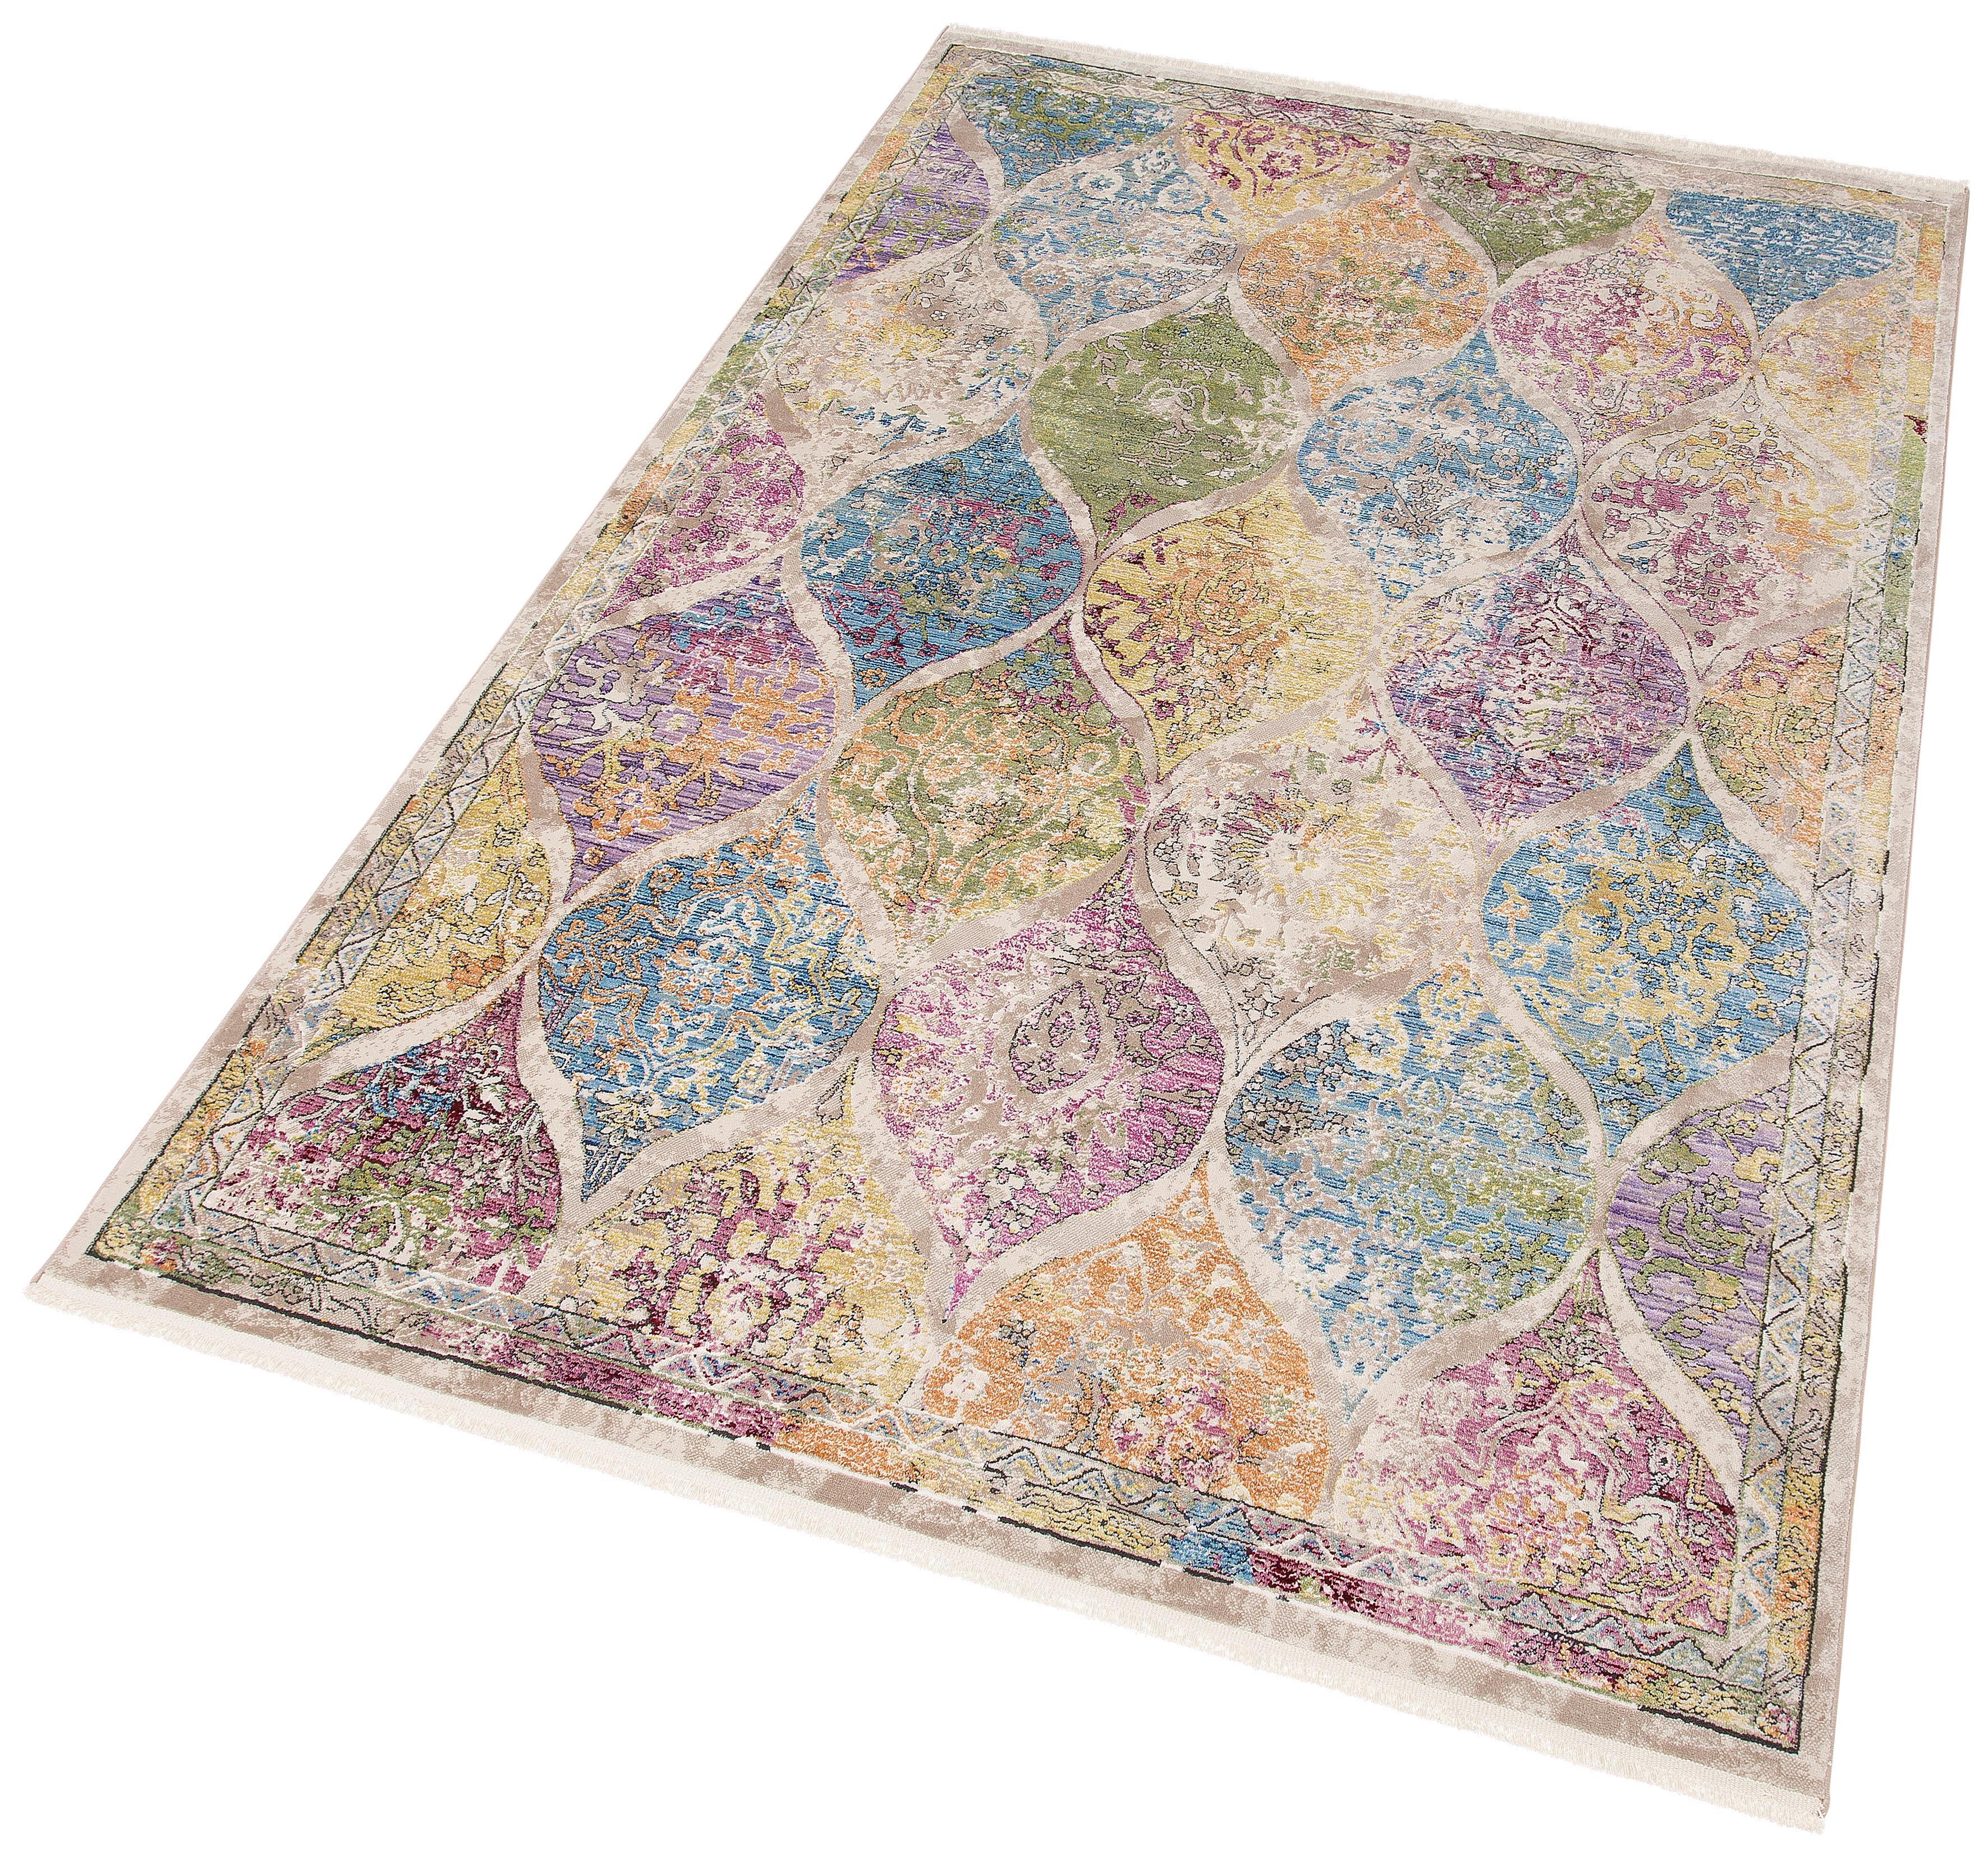 Teppich Colorful 24021 merinos rechteckig Höhe 7 mm maschinell gewebt